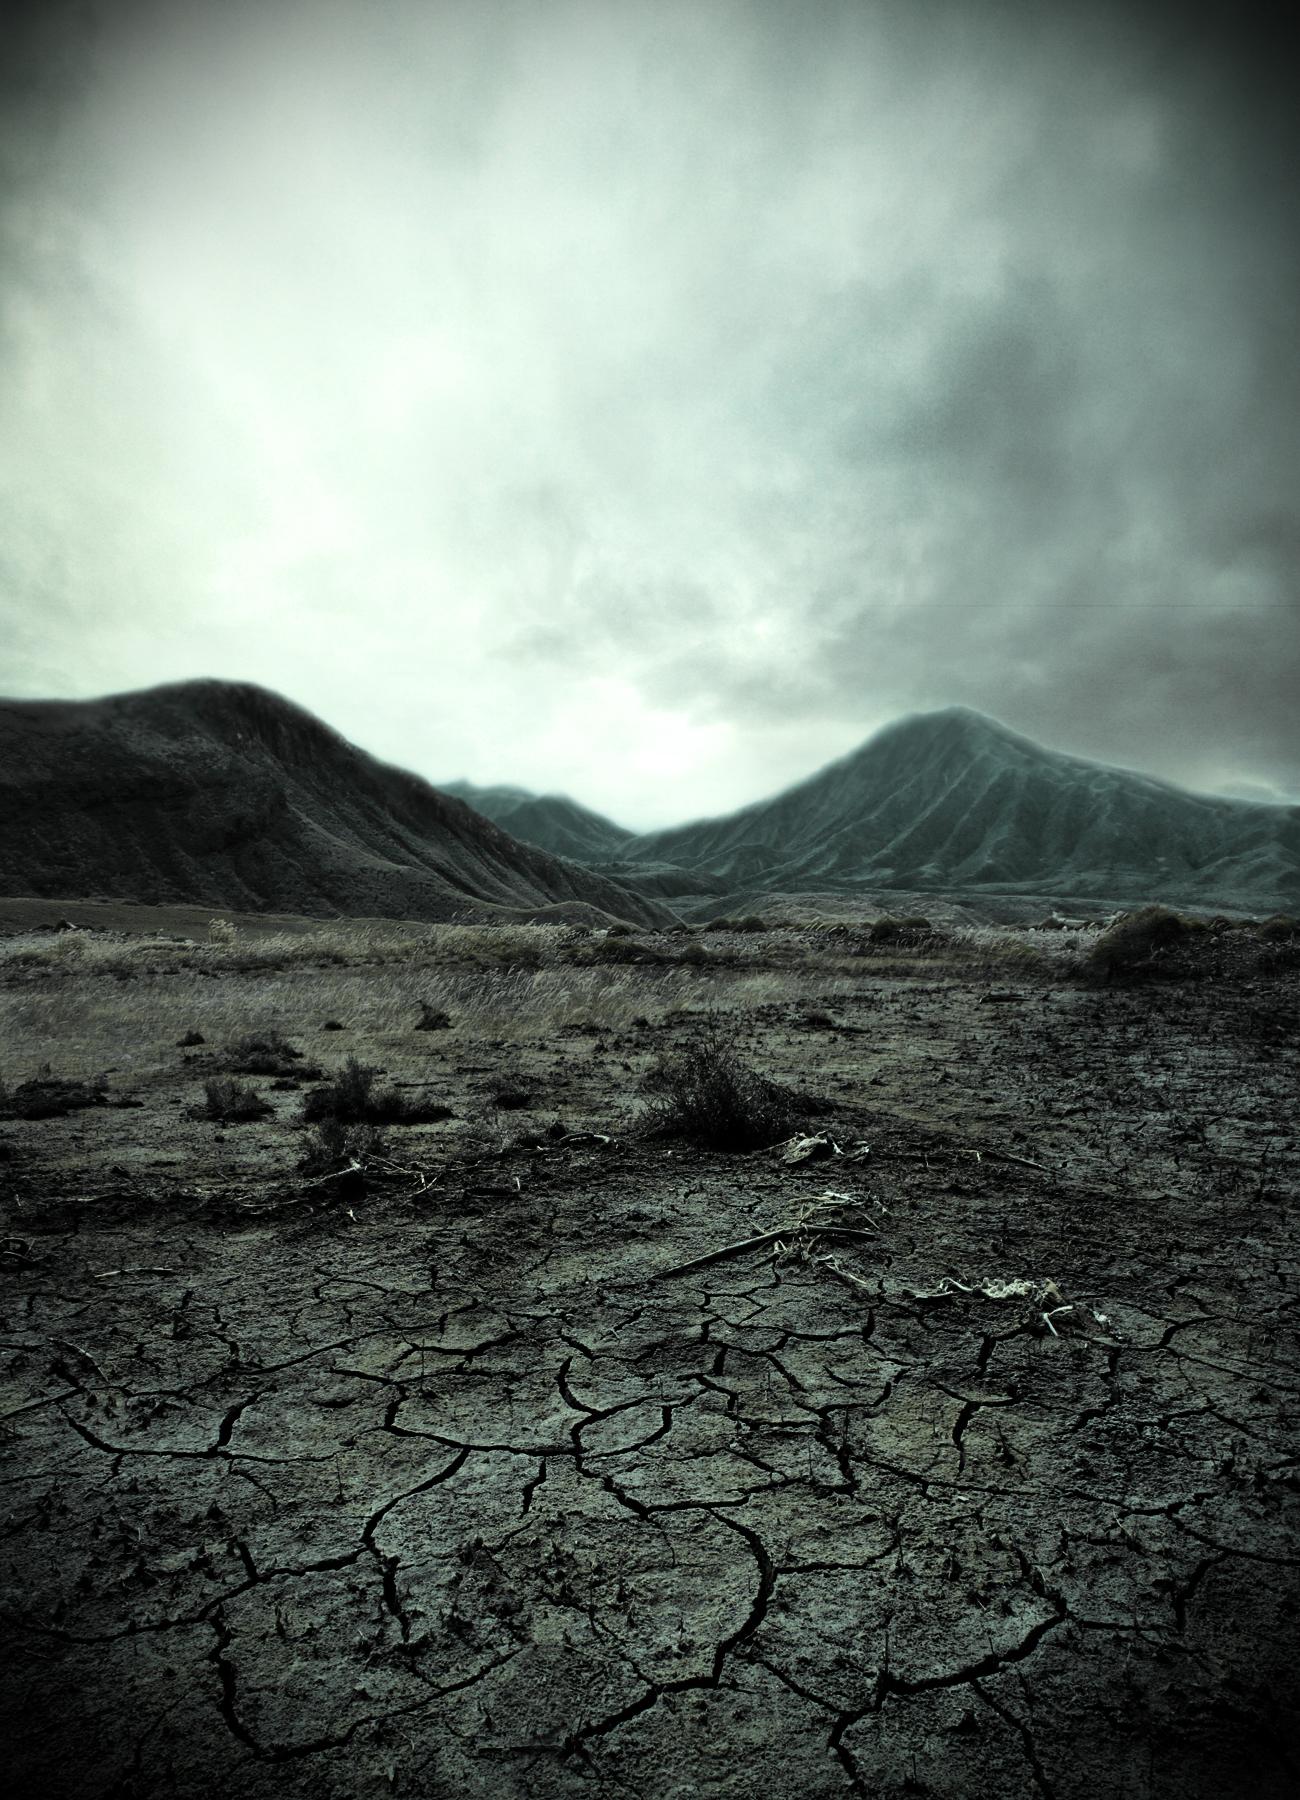 Barren landscape by nimiel78 on deviantart